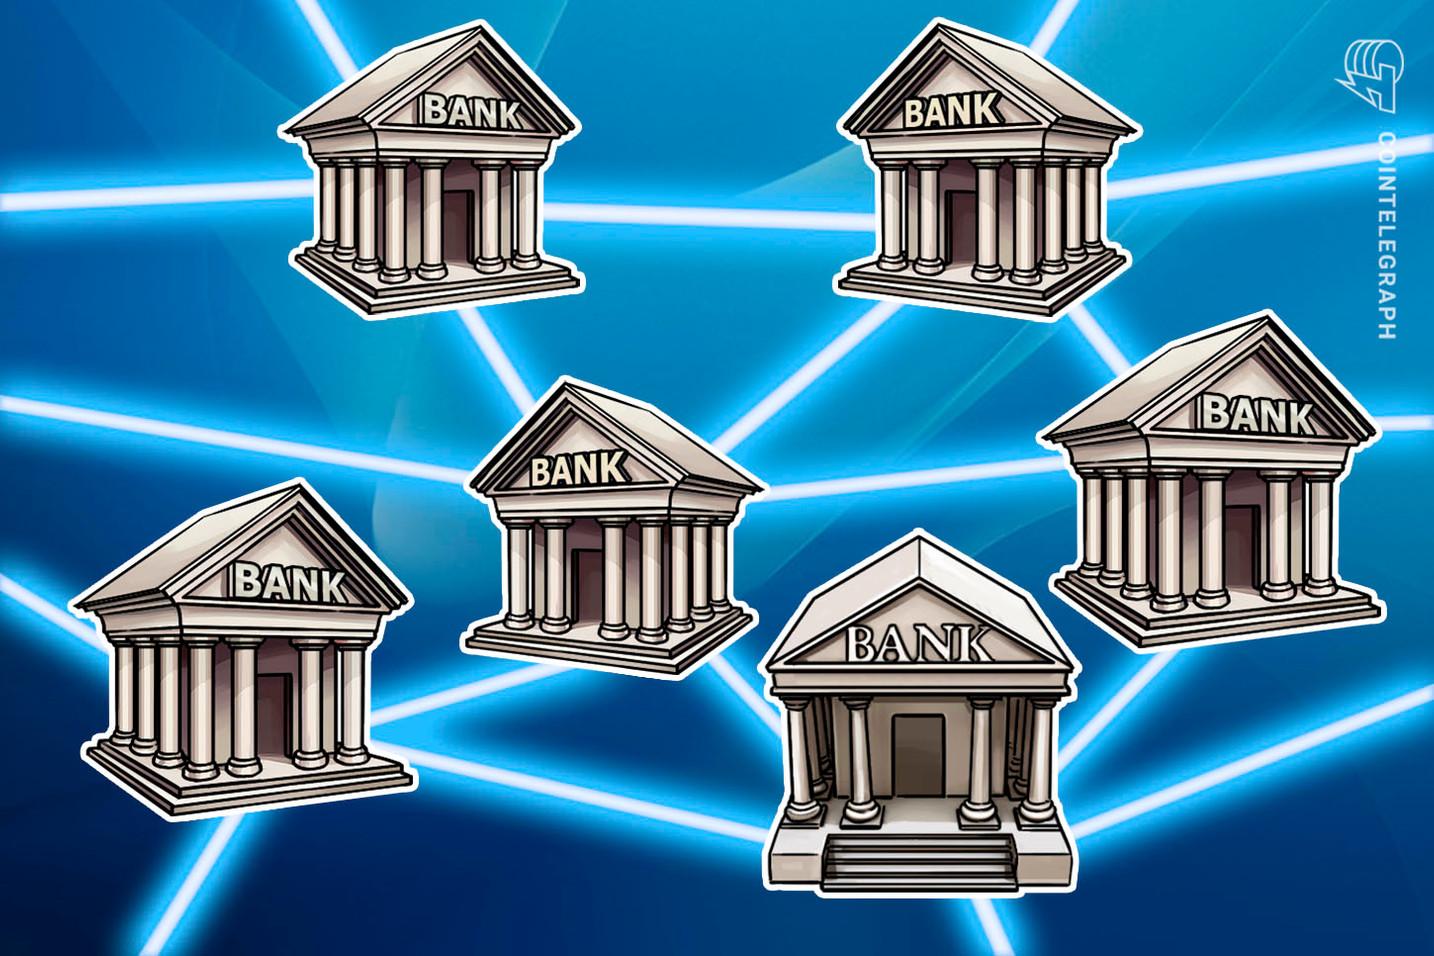 JPMorgan busca adicionar novos recursos a rede baseada em blockchain para bancos globais